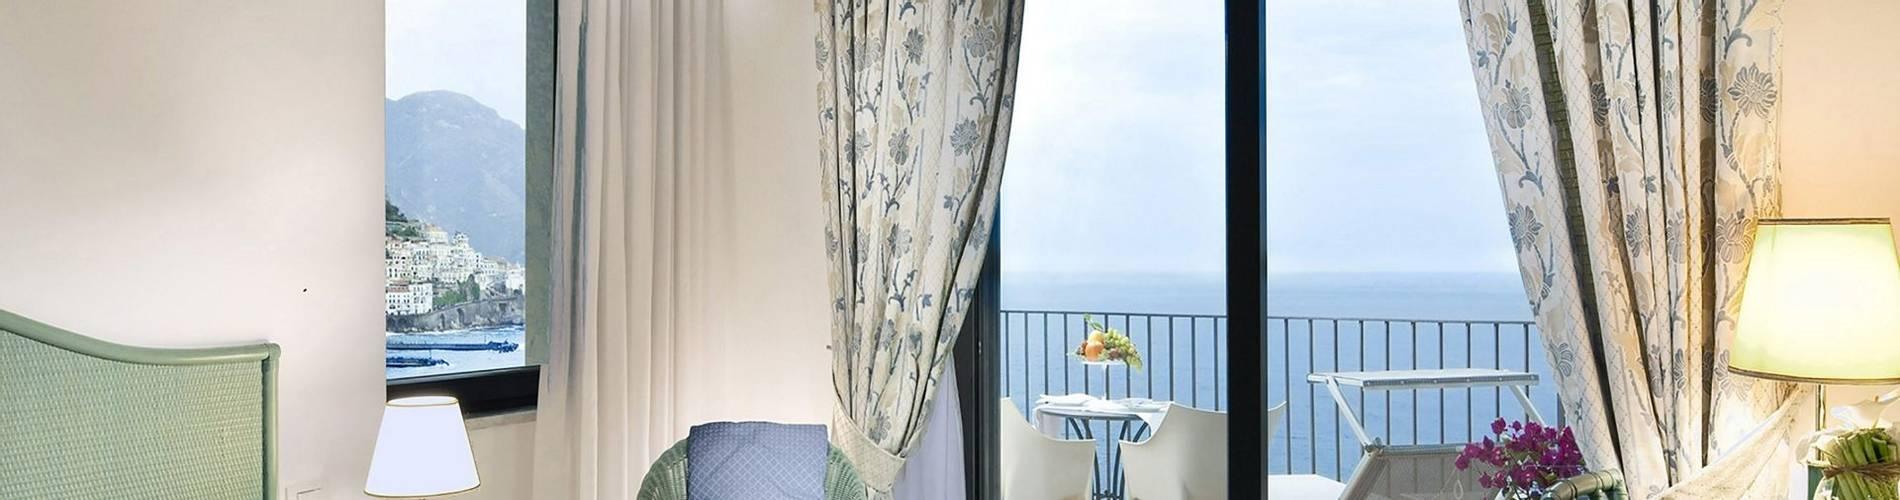 Miramalfi, Amalfi Coast, Italy, Superior.jpg